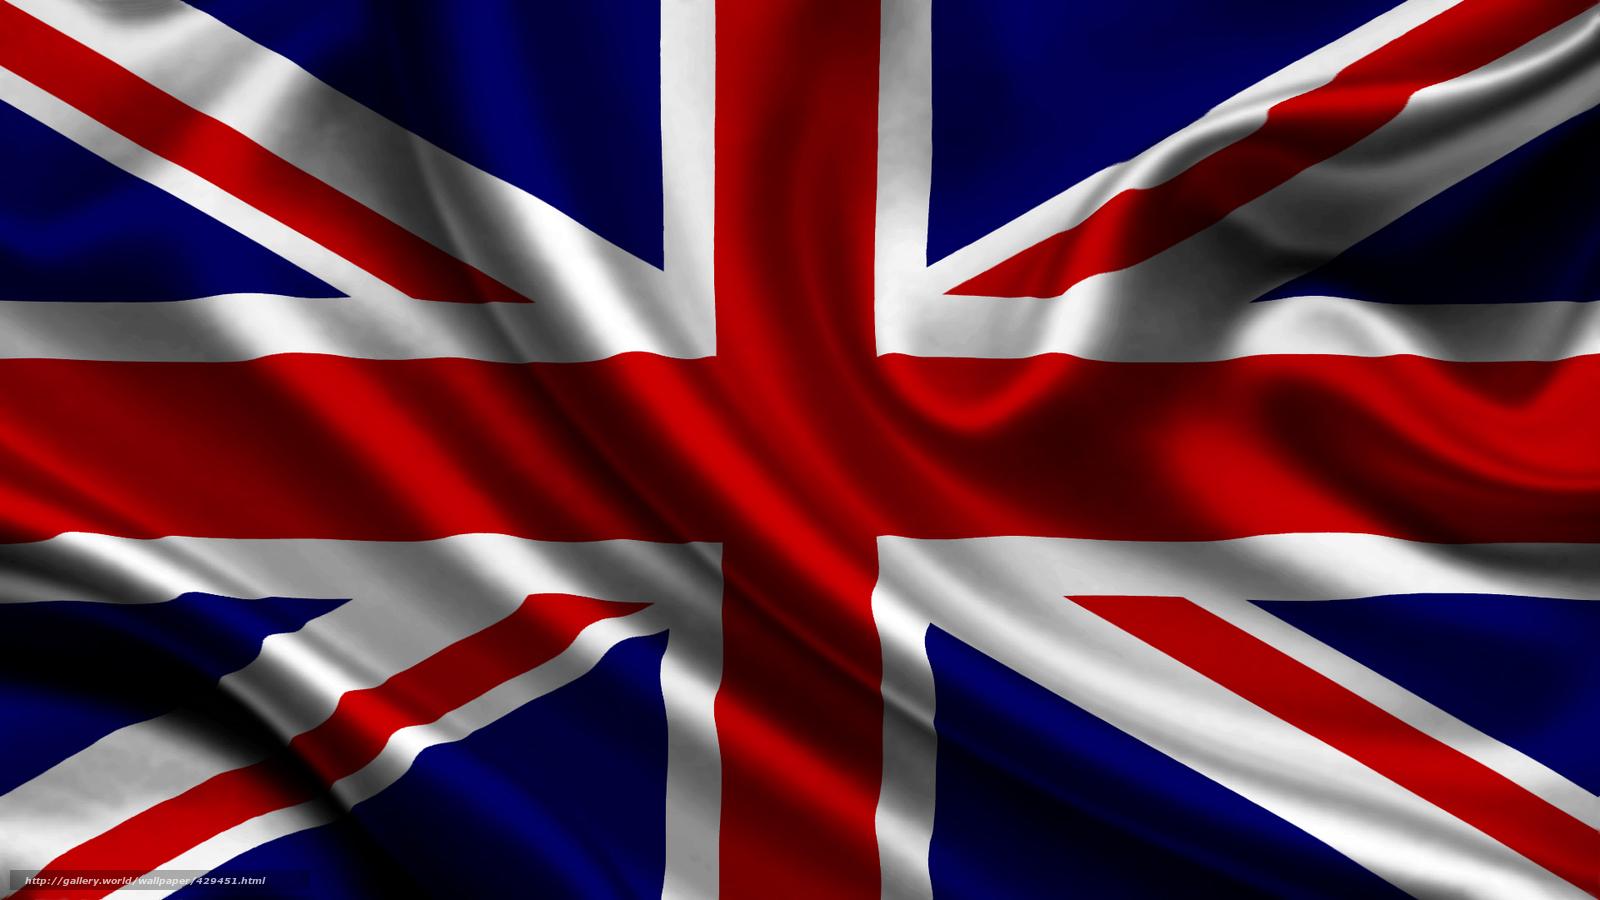 Download wallpaper united kingdom satin flag United 1600x900